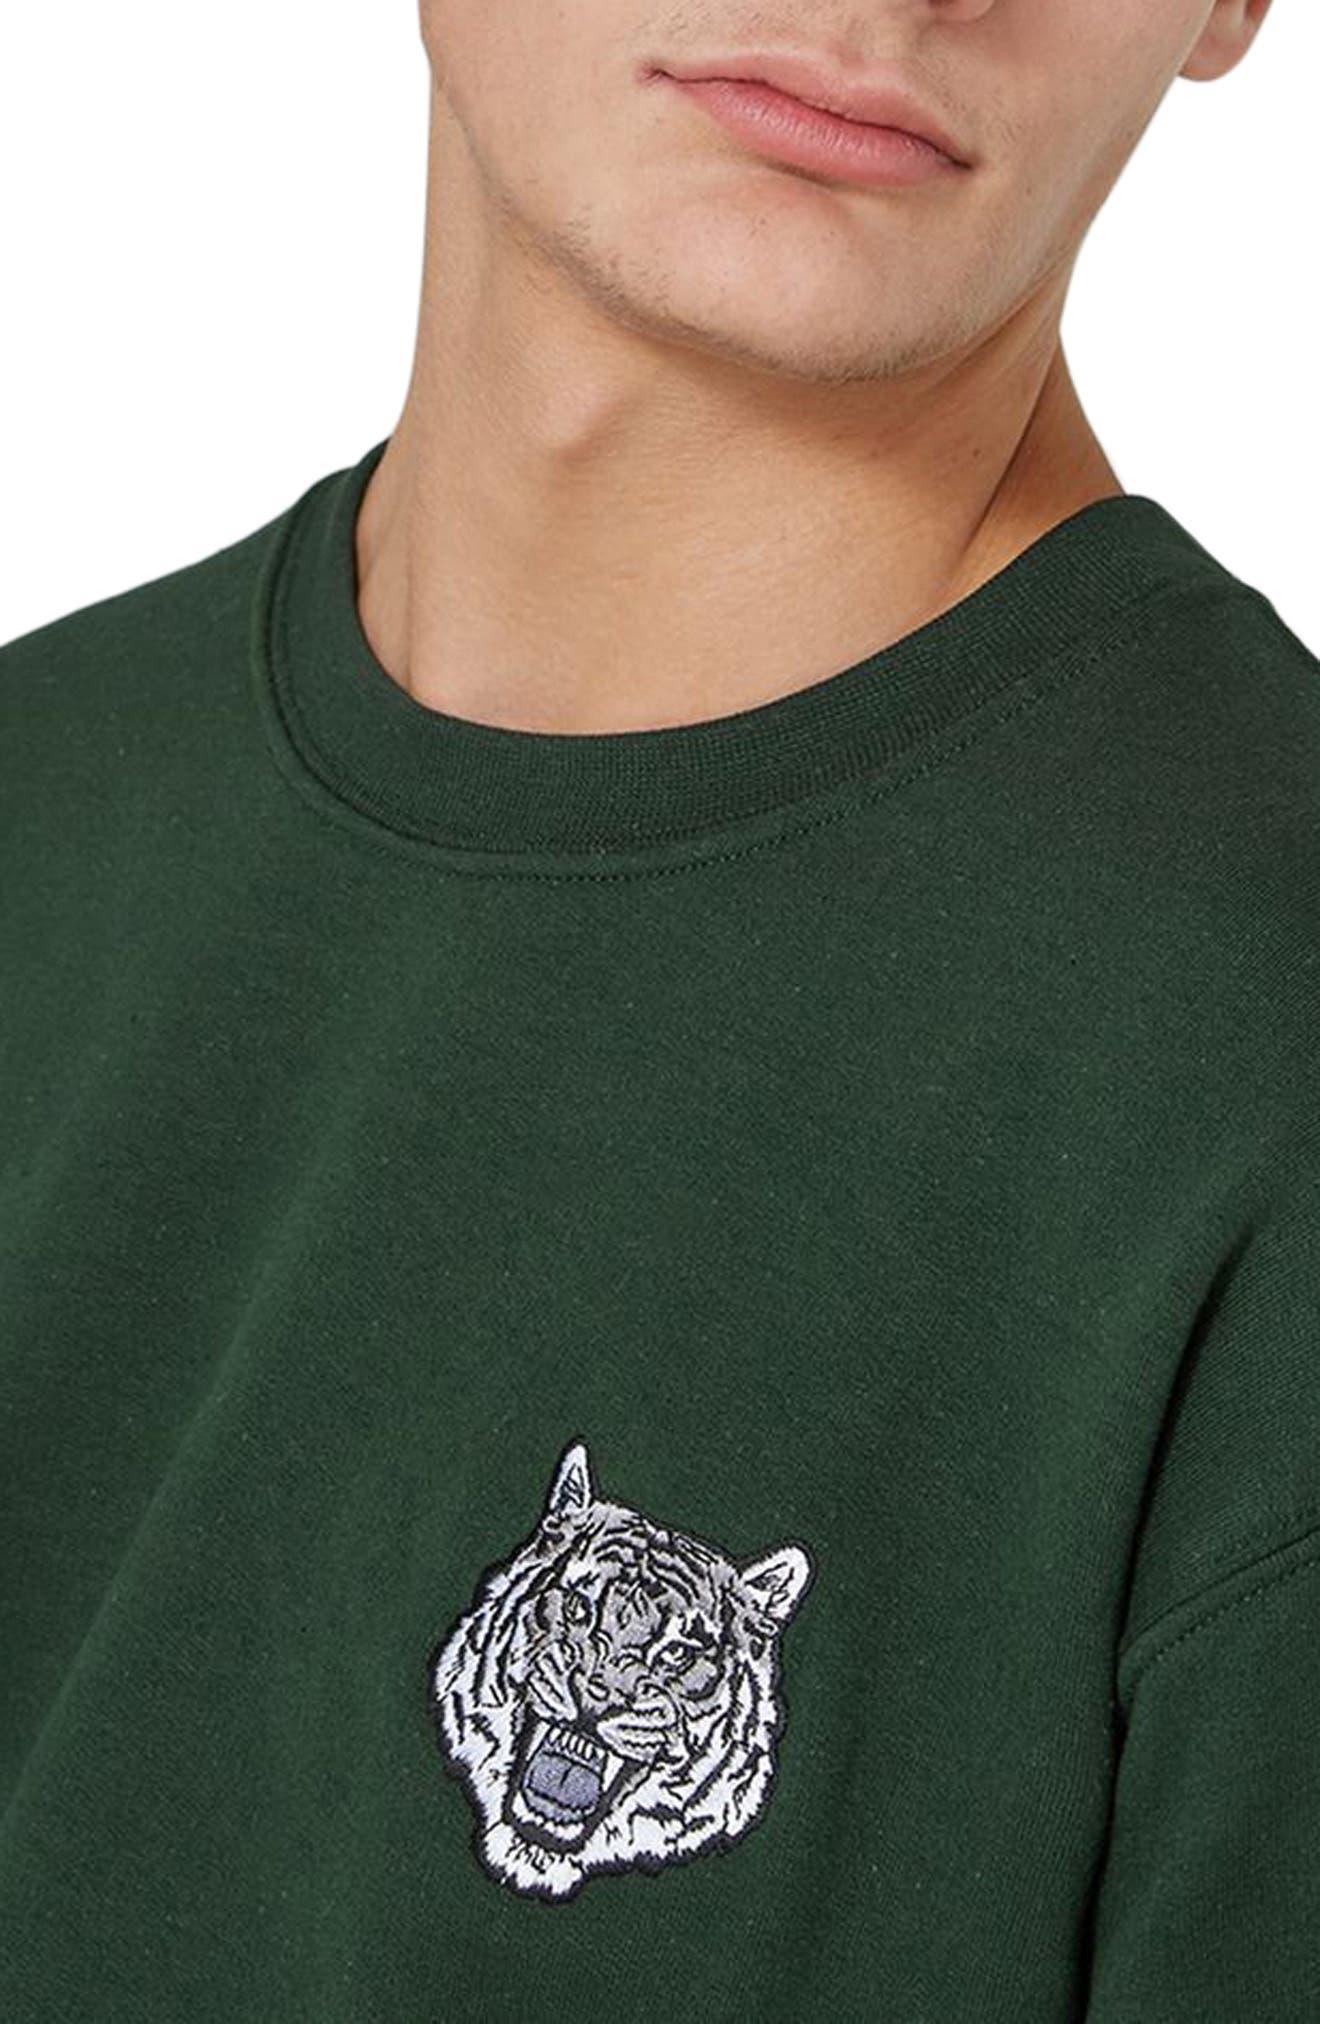 Tiger Patch Sweatshirt,                             Alternate thumbnail 3, color,                             Olive